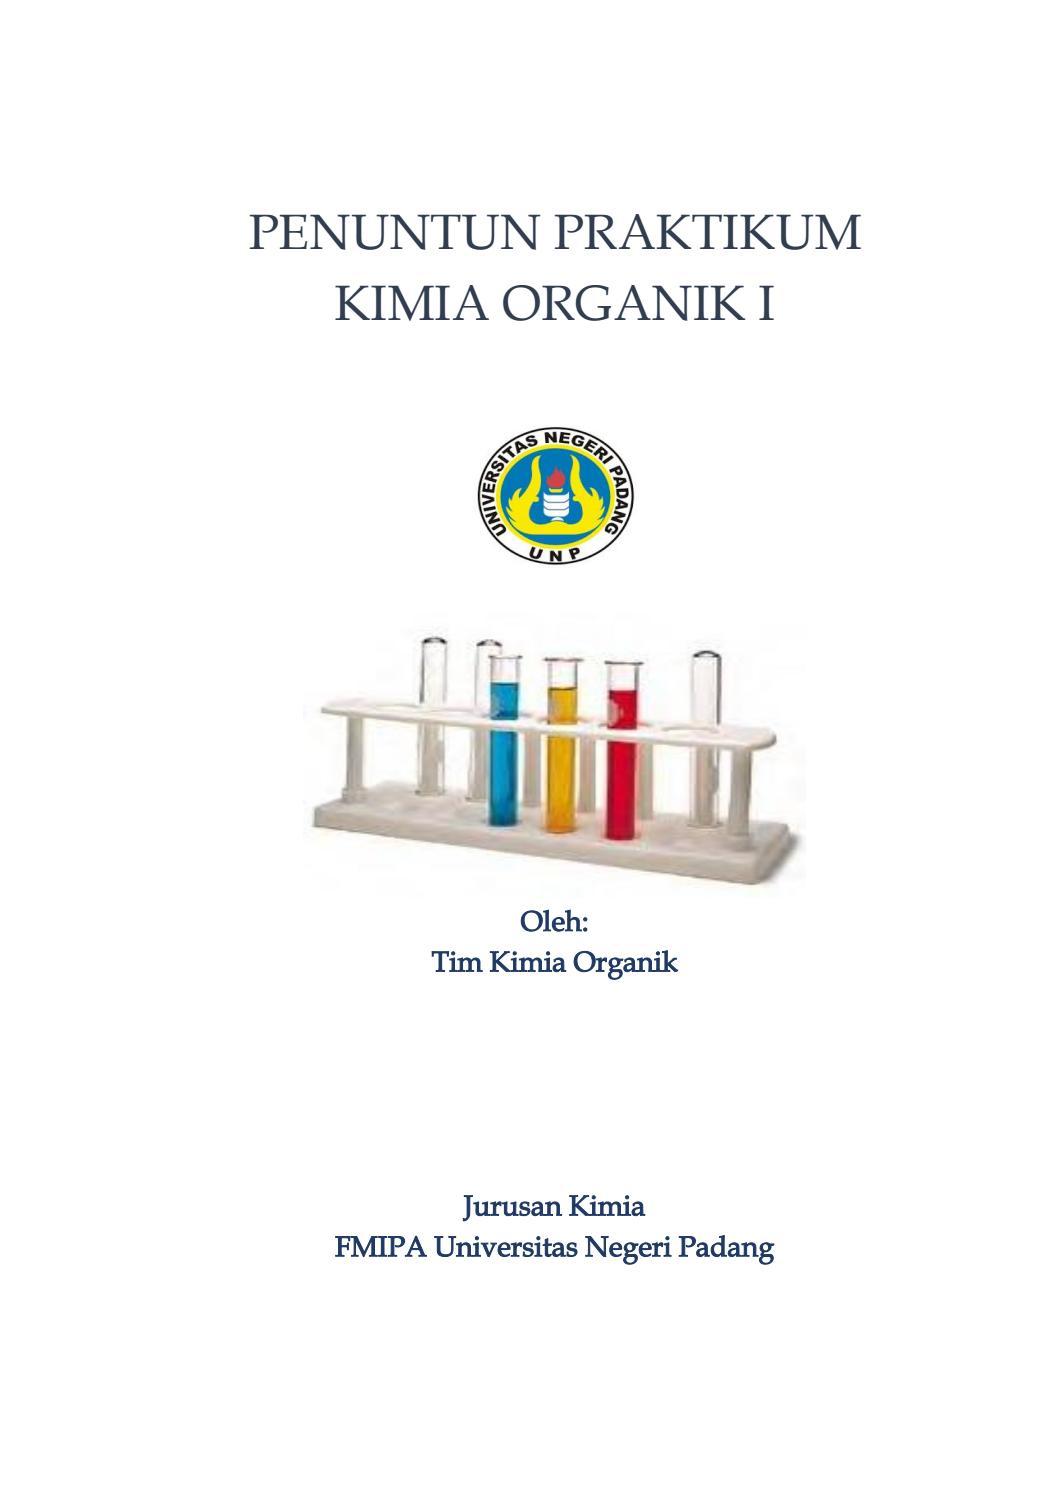 Penuntun Praktikum Kimia Organik 1 By Adli Hadiyan Issuu